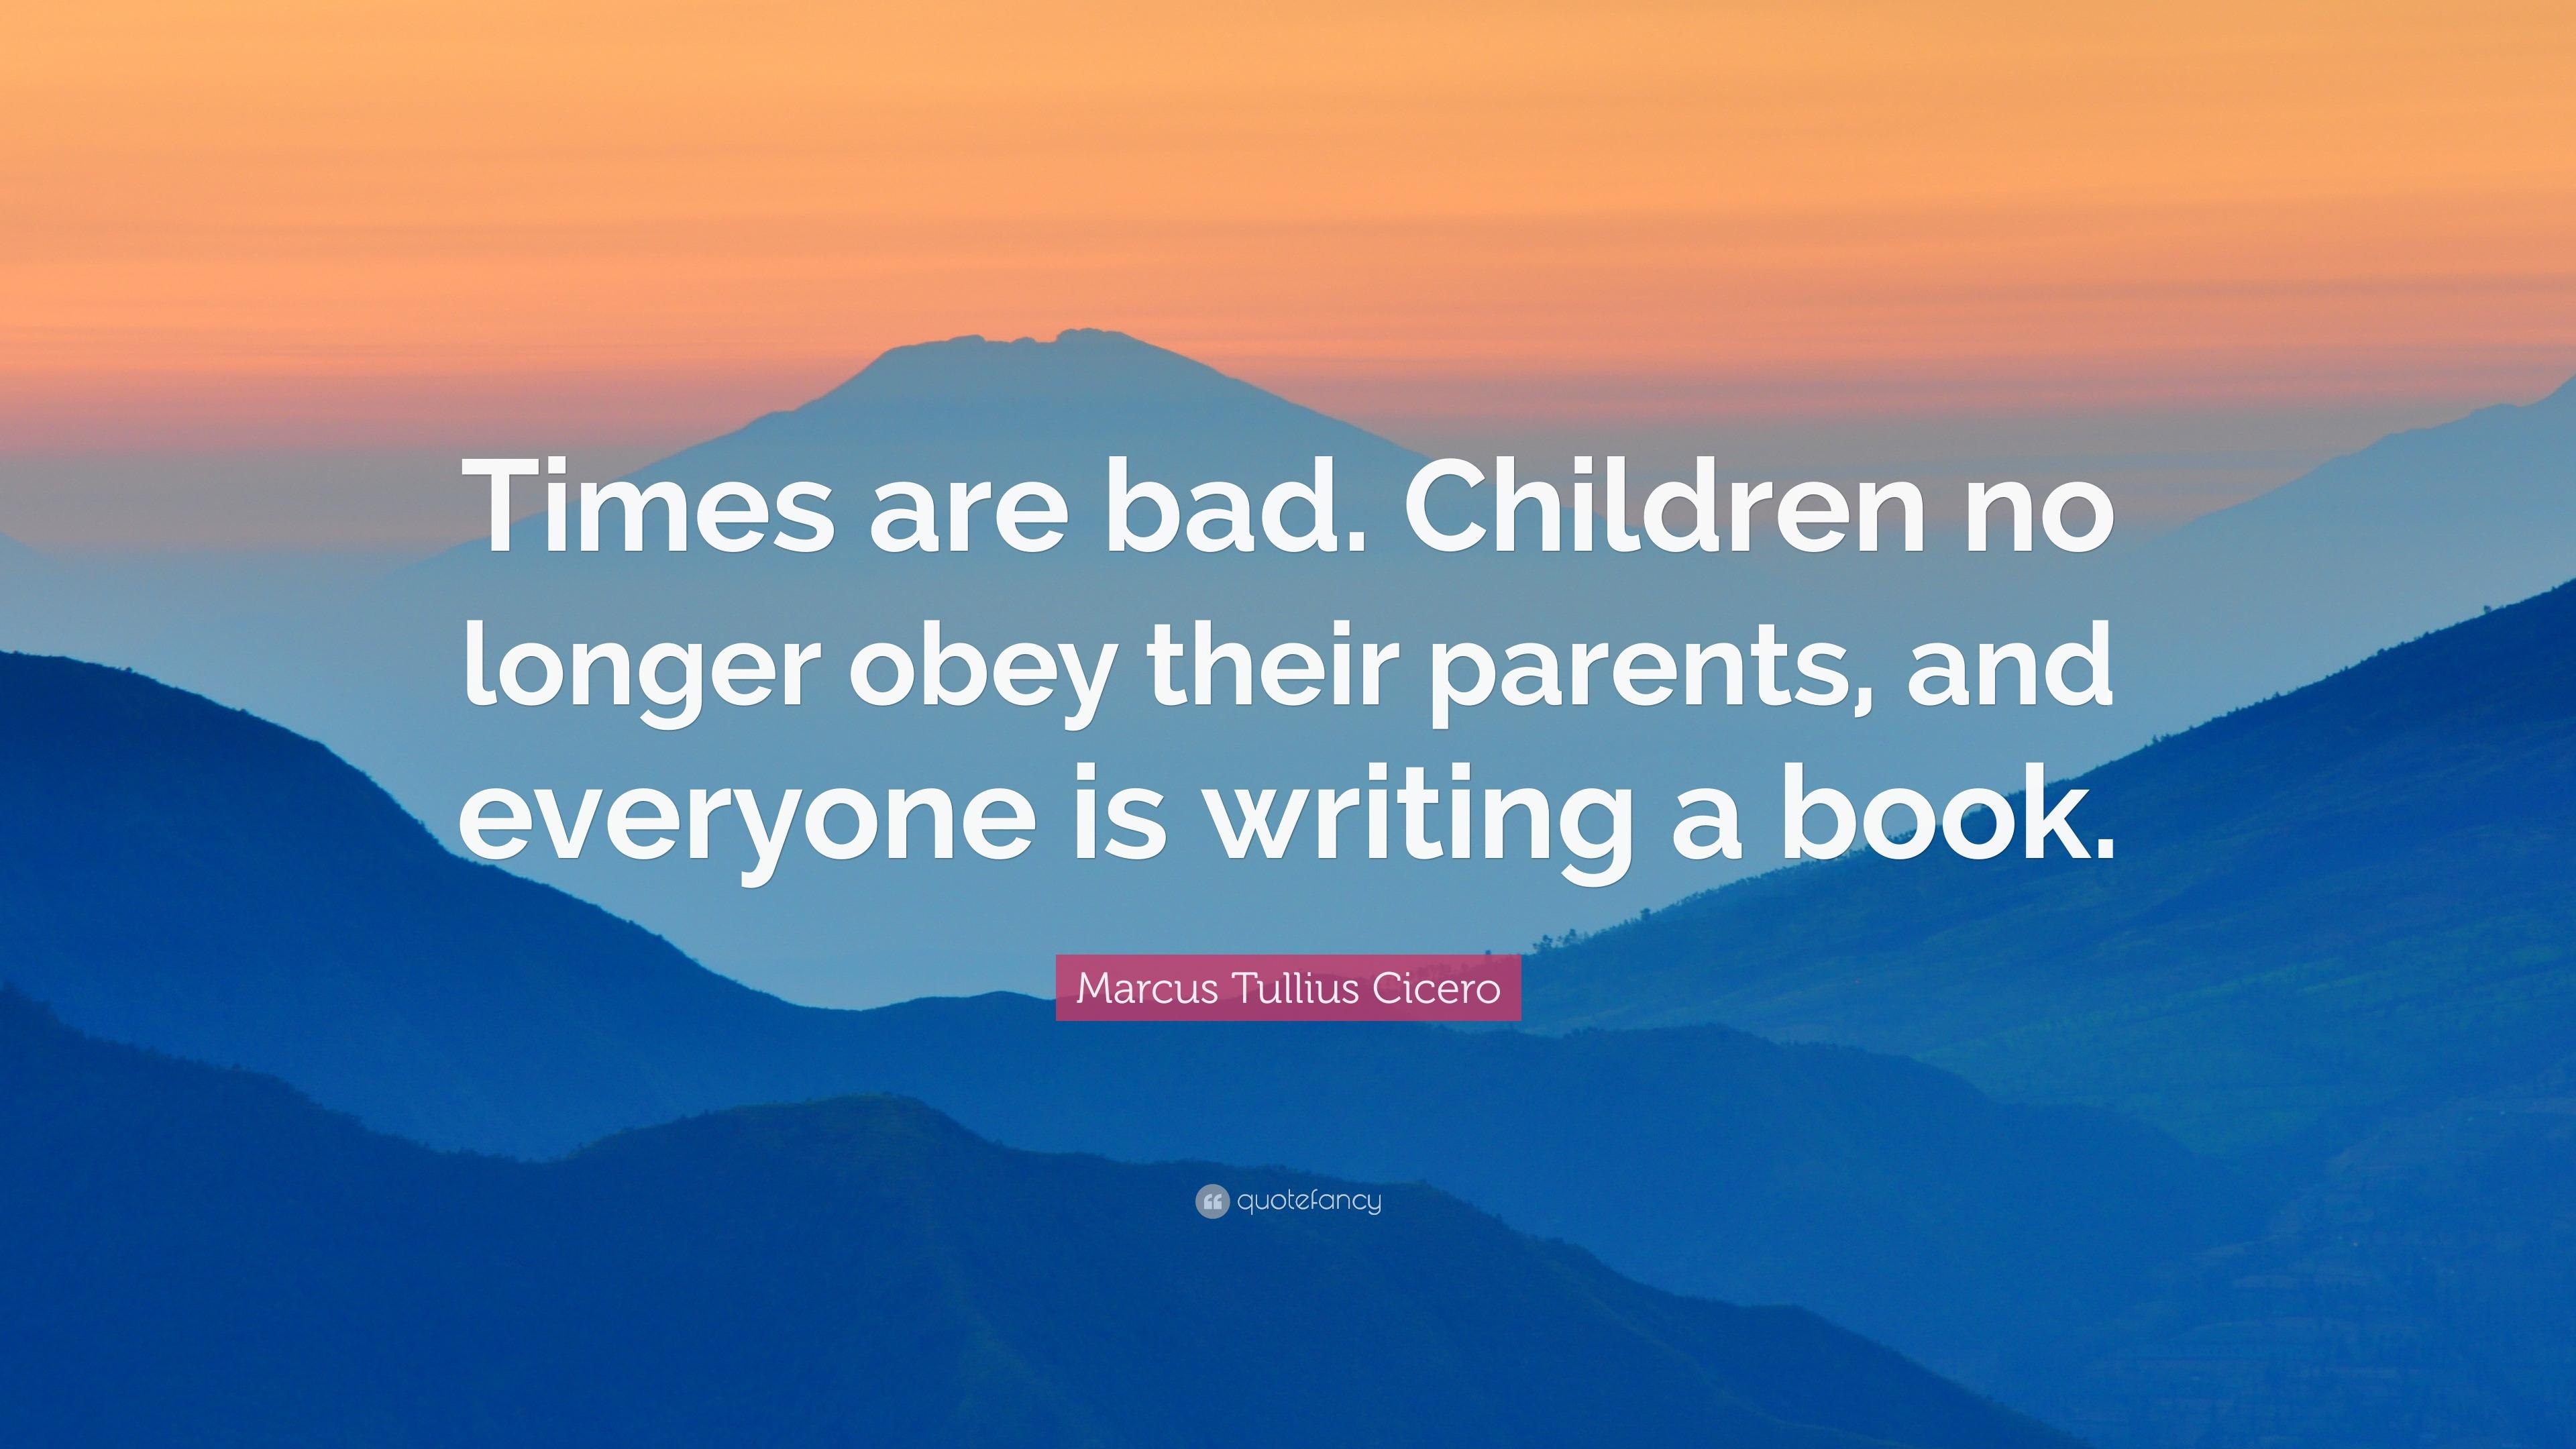 Essay should children obey their parents